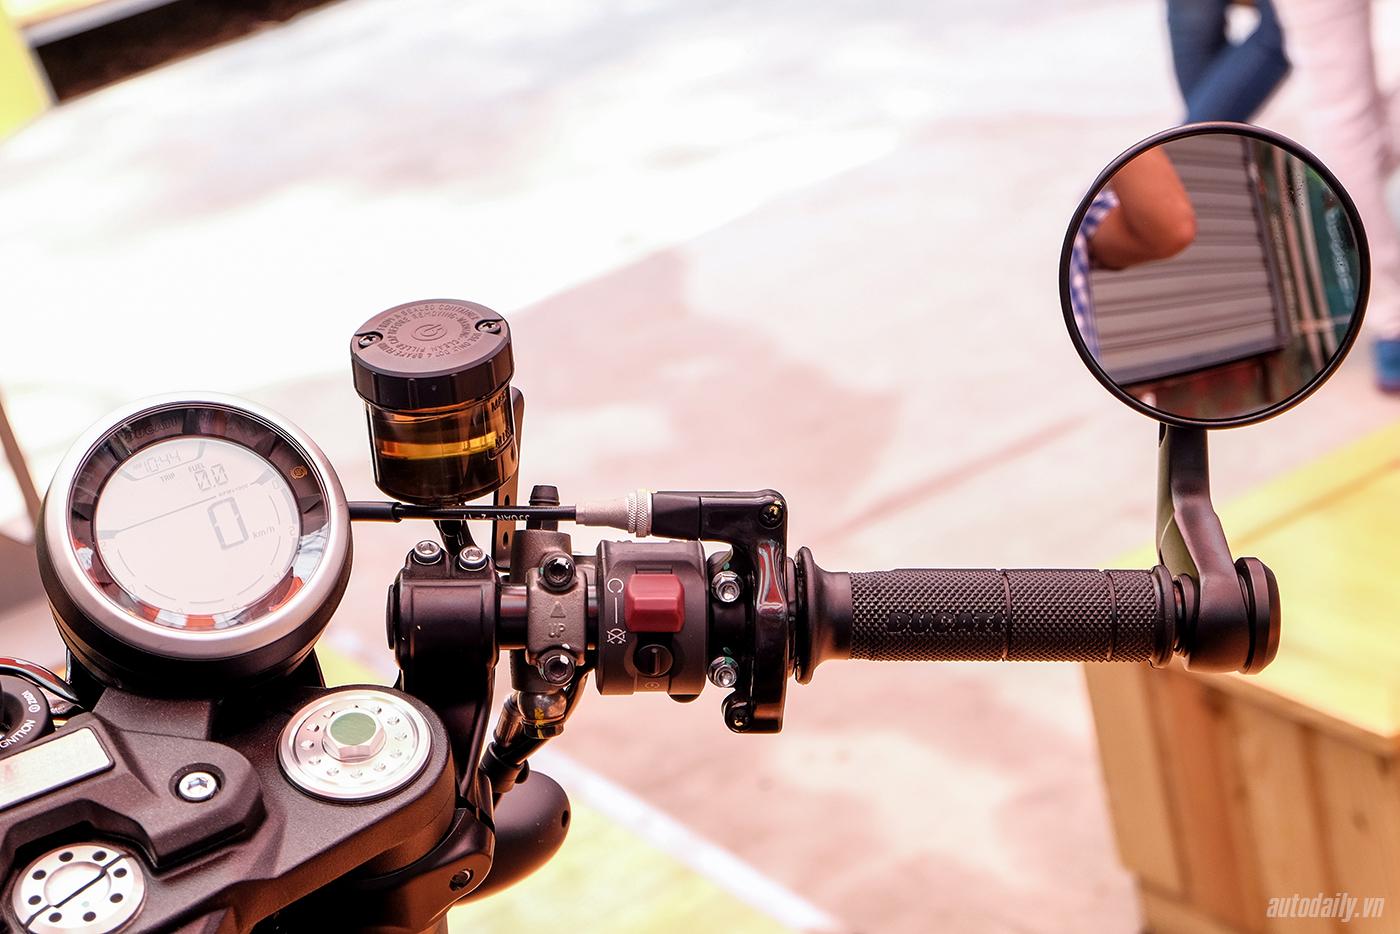 ducati-scrambler-cafe-racer-28.jpg